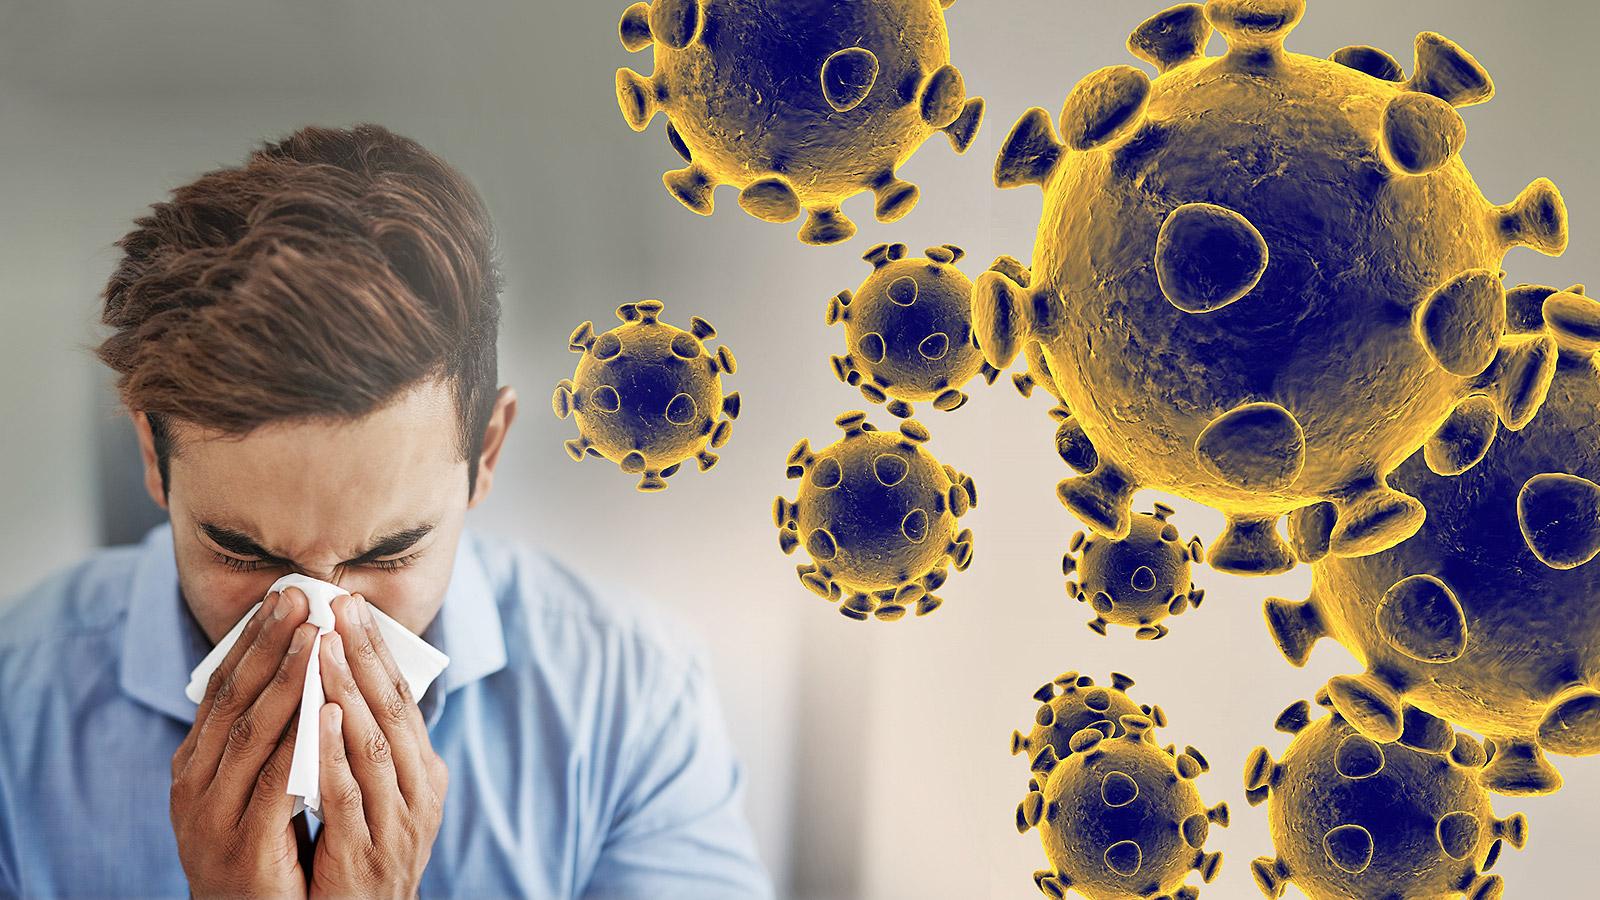 CORONA VIRUS PRODUCTS